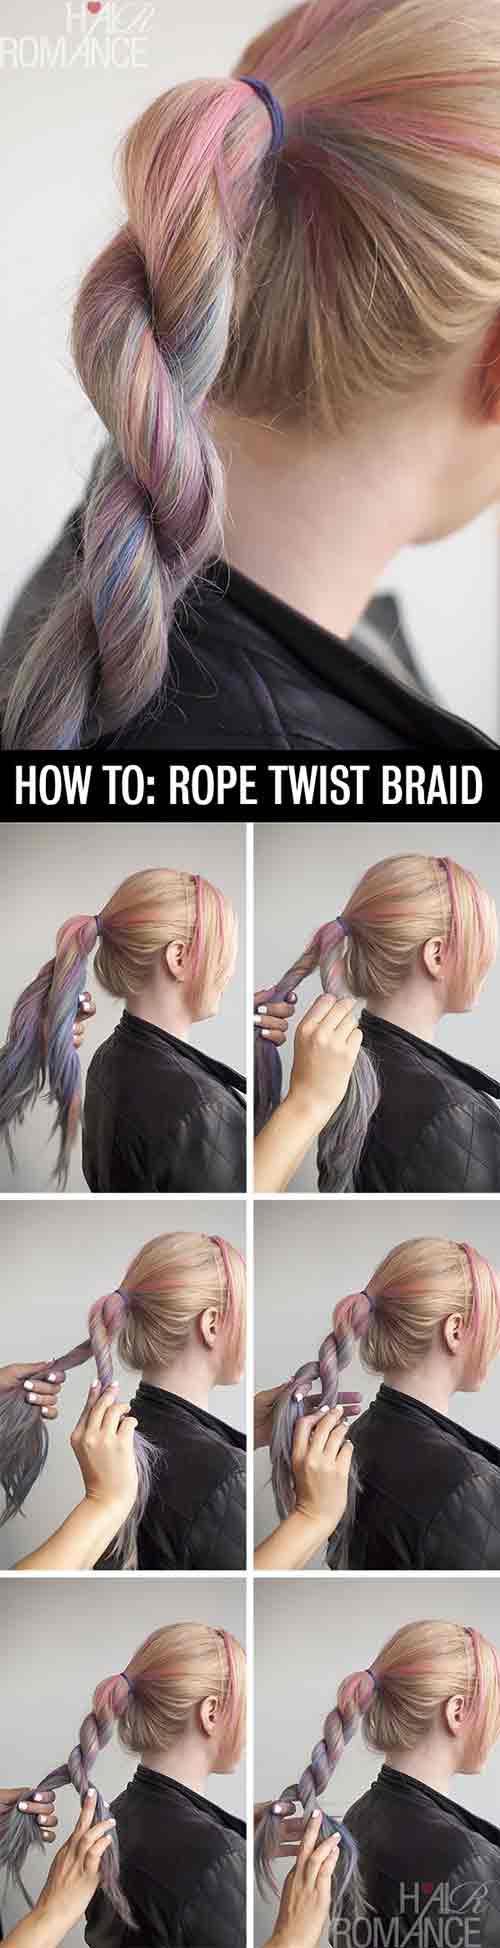 6. Rope Twisted Braid